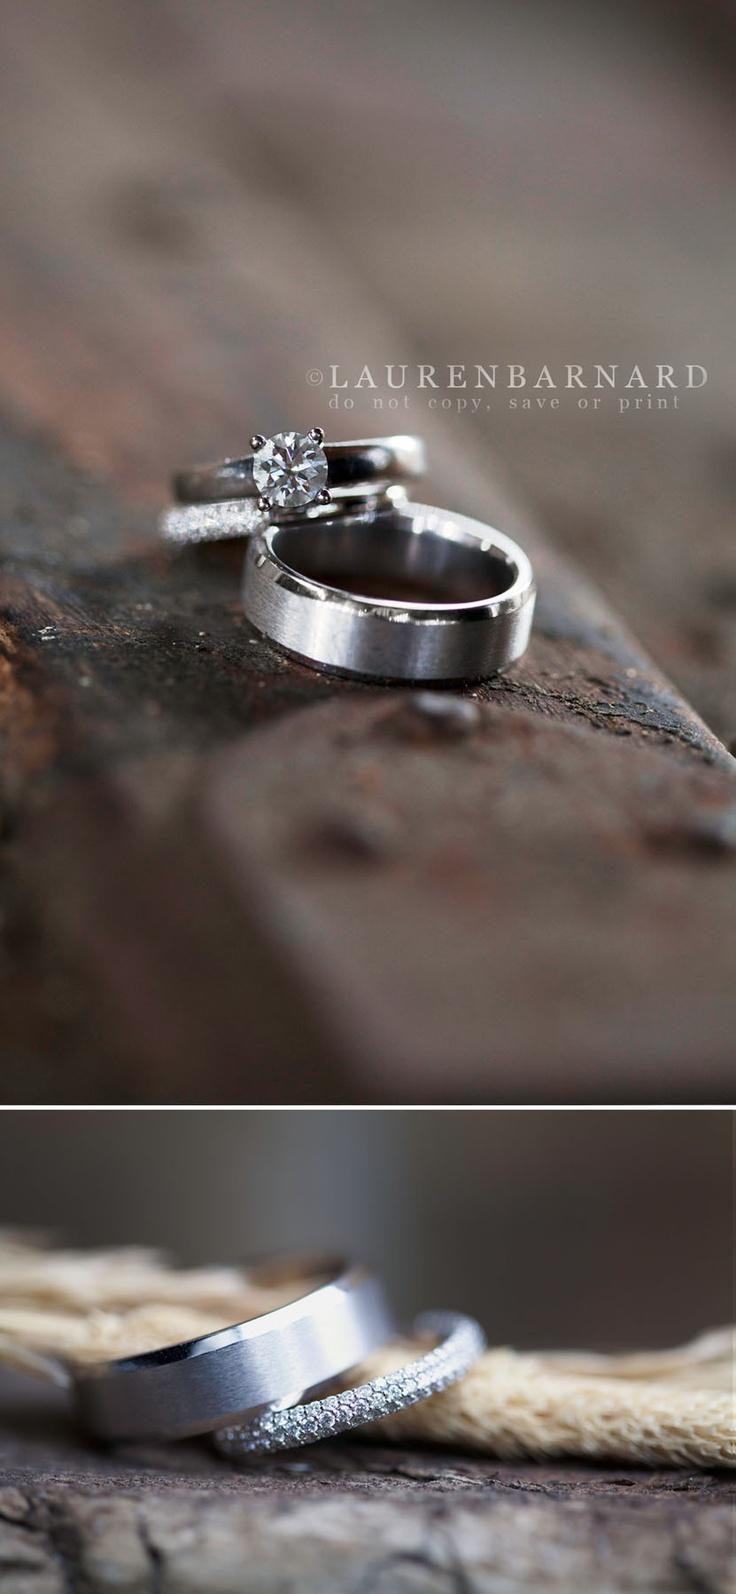 Lauren Barnard Photography #wedding #weddingrings #ringshot